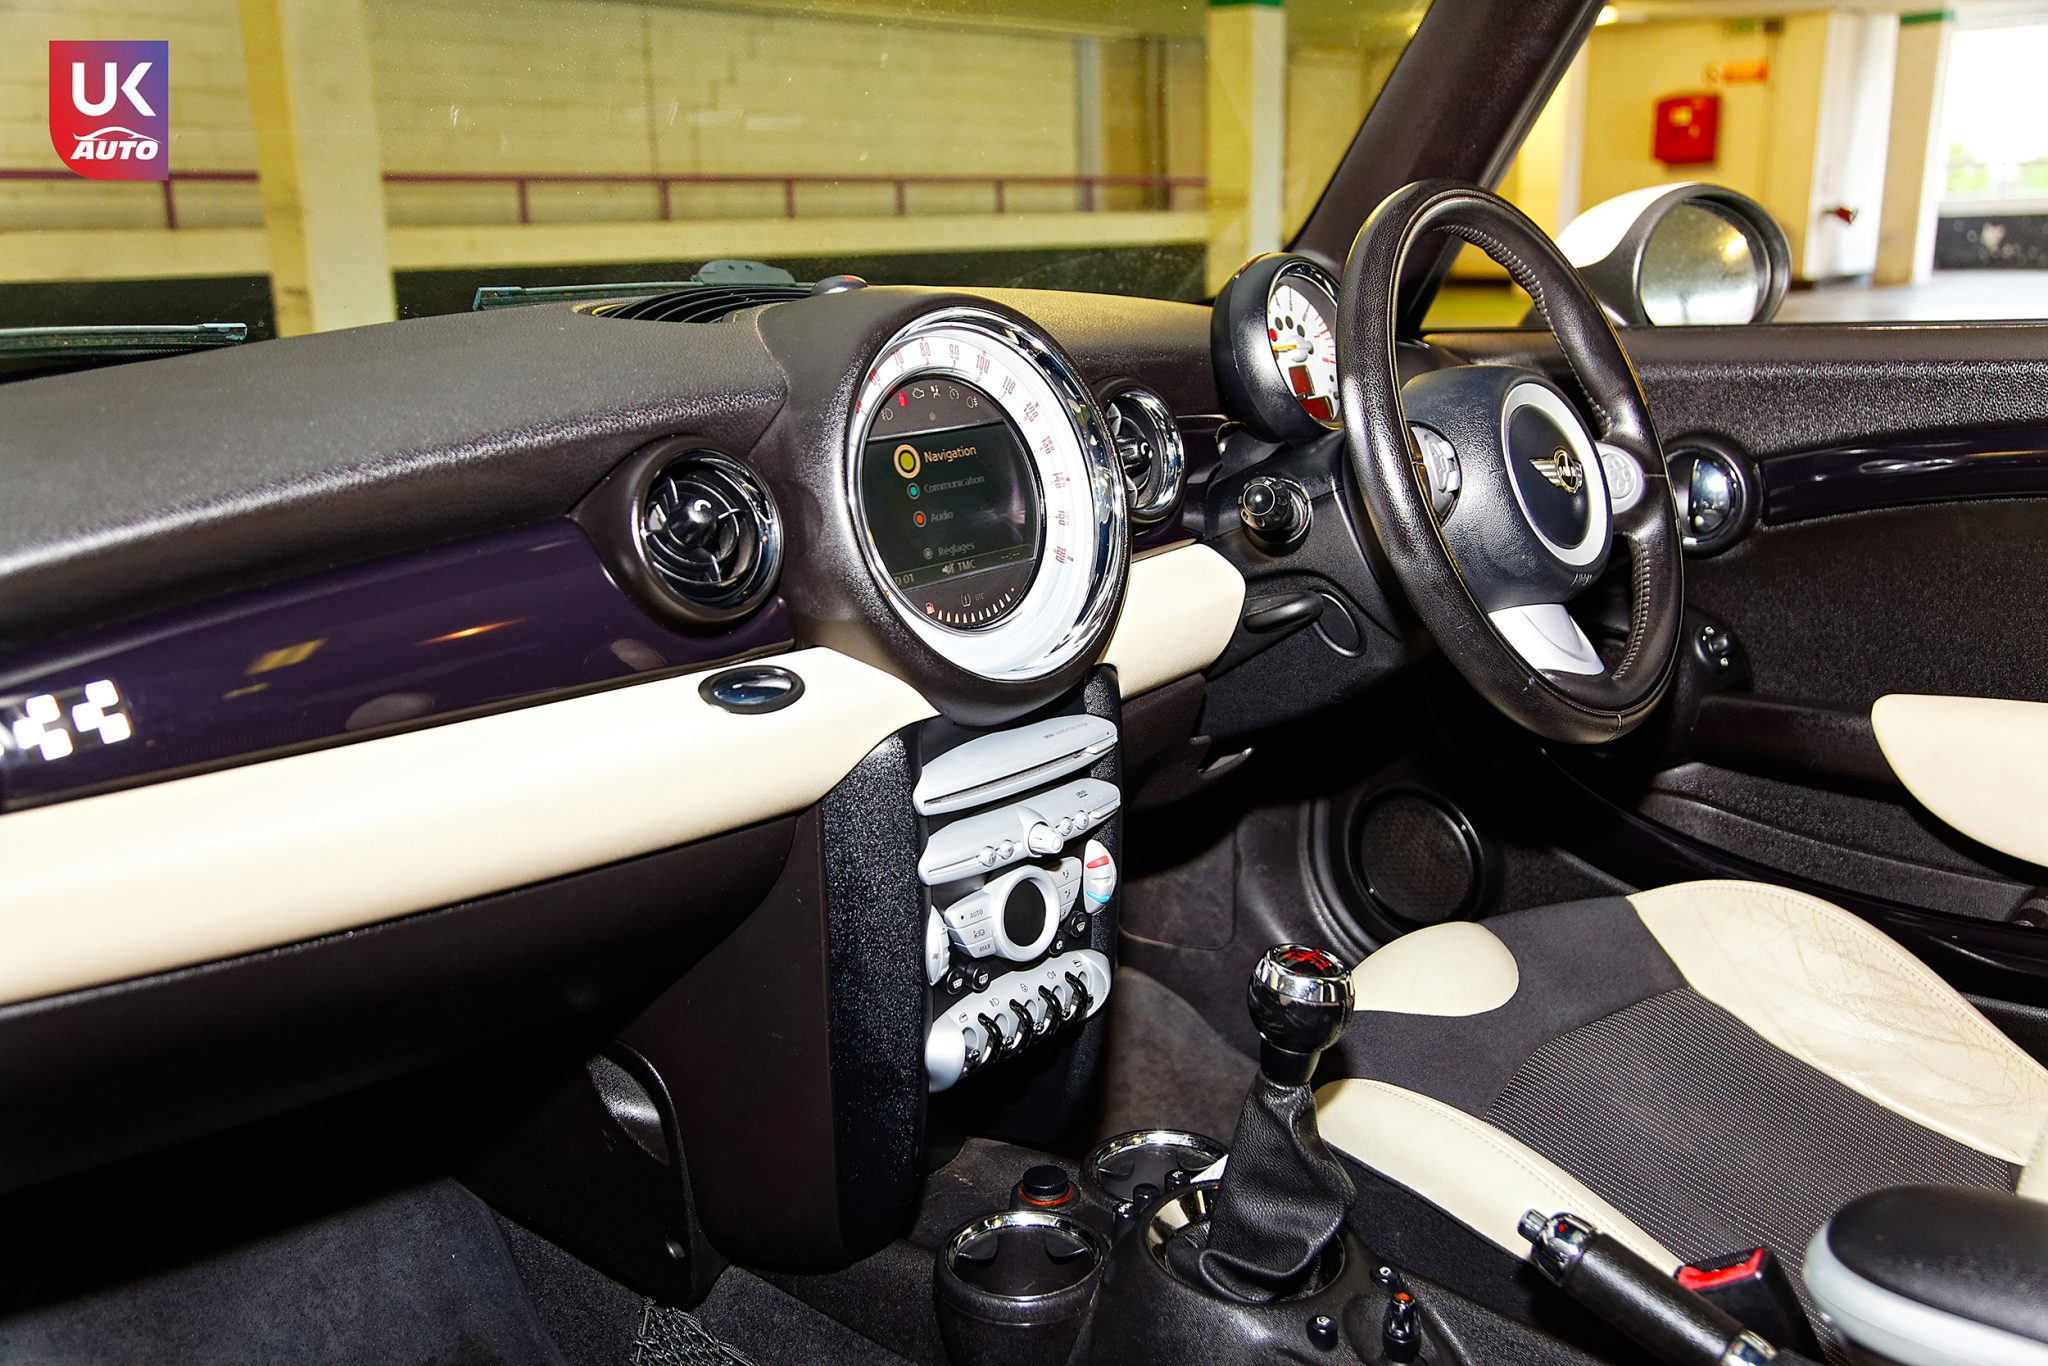 uk mini angleterre mini cooper jcw john cooper works importation angleterre voiture occasion angleterre5 - Felicitation a Antoine Mini Cooper JCW John Cooper Works R56 voiture d'occasion en Angleterre